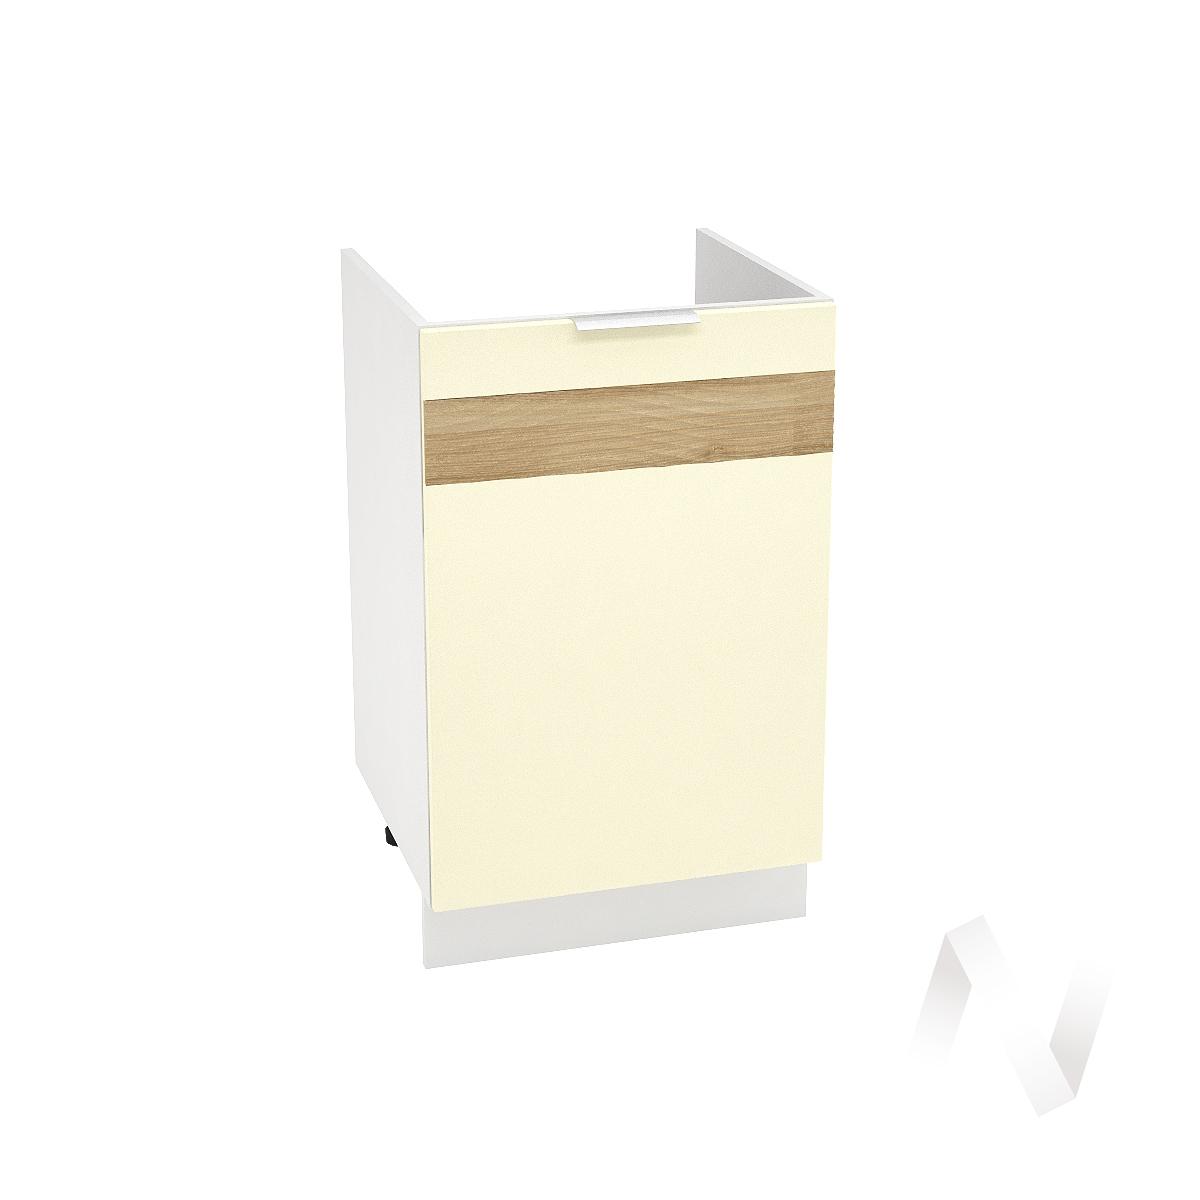 "Кухня ""Терра"": Шкаф нижний правый под мойку 500, ШНМ 500 (ваниль софт/корпус белый)"